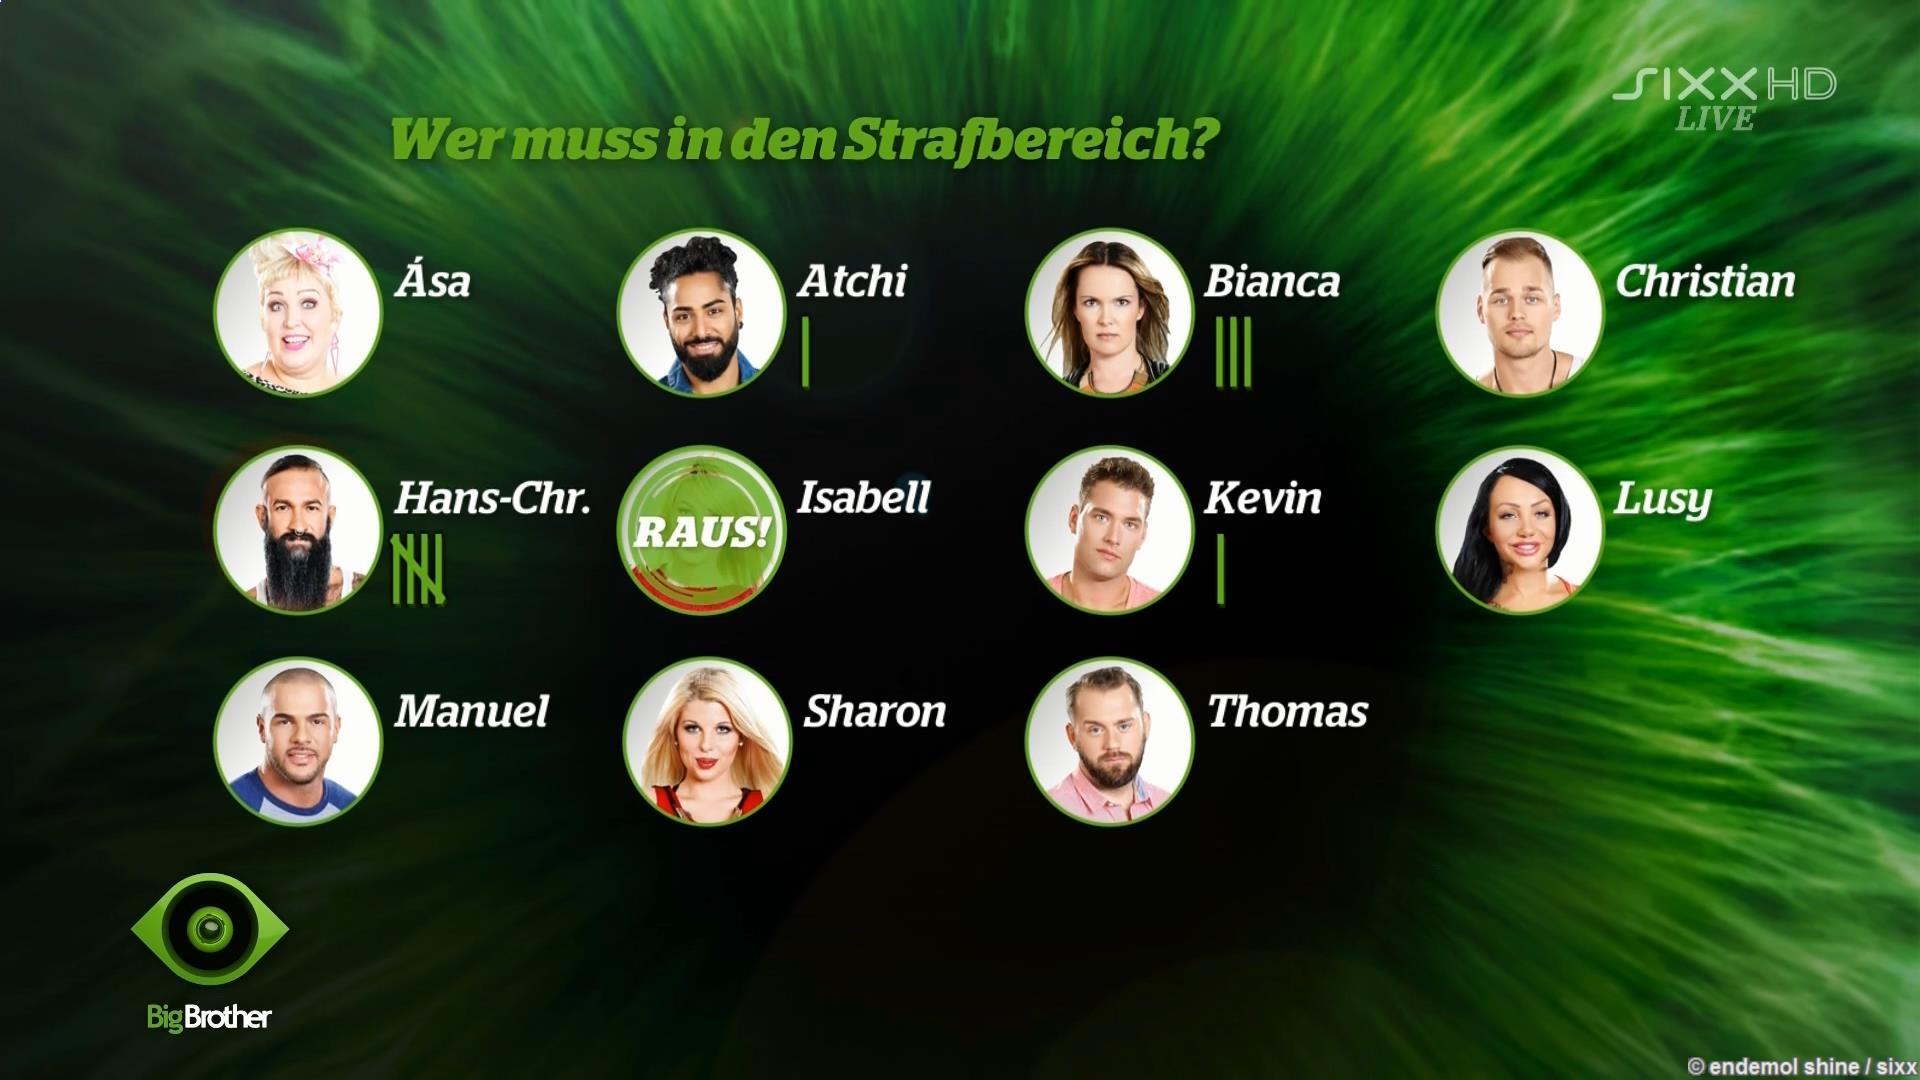 Big Brother 2015 Strafbereich Voting